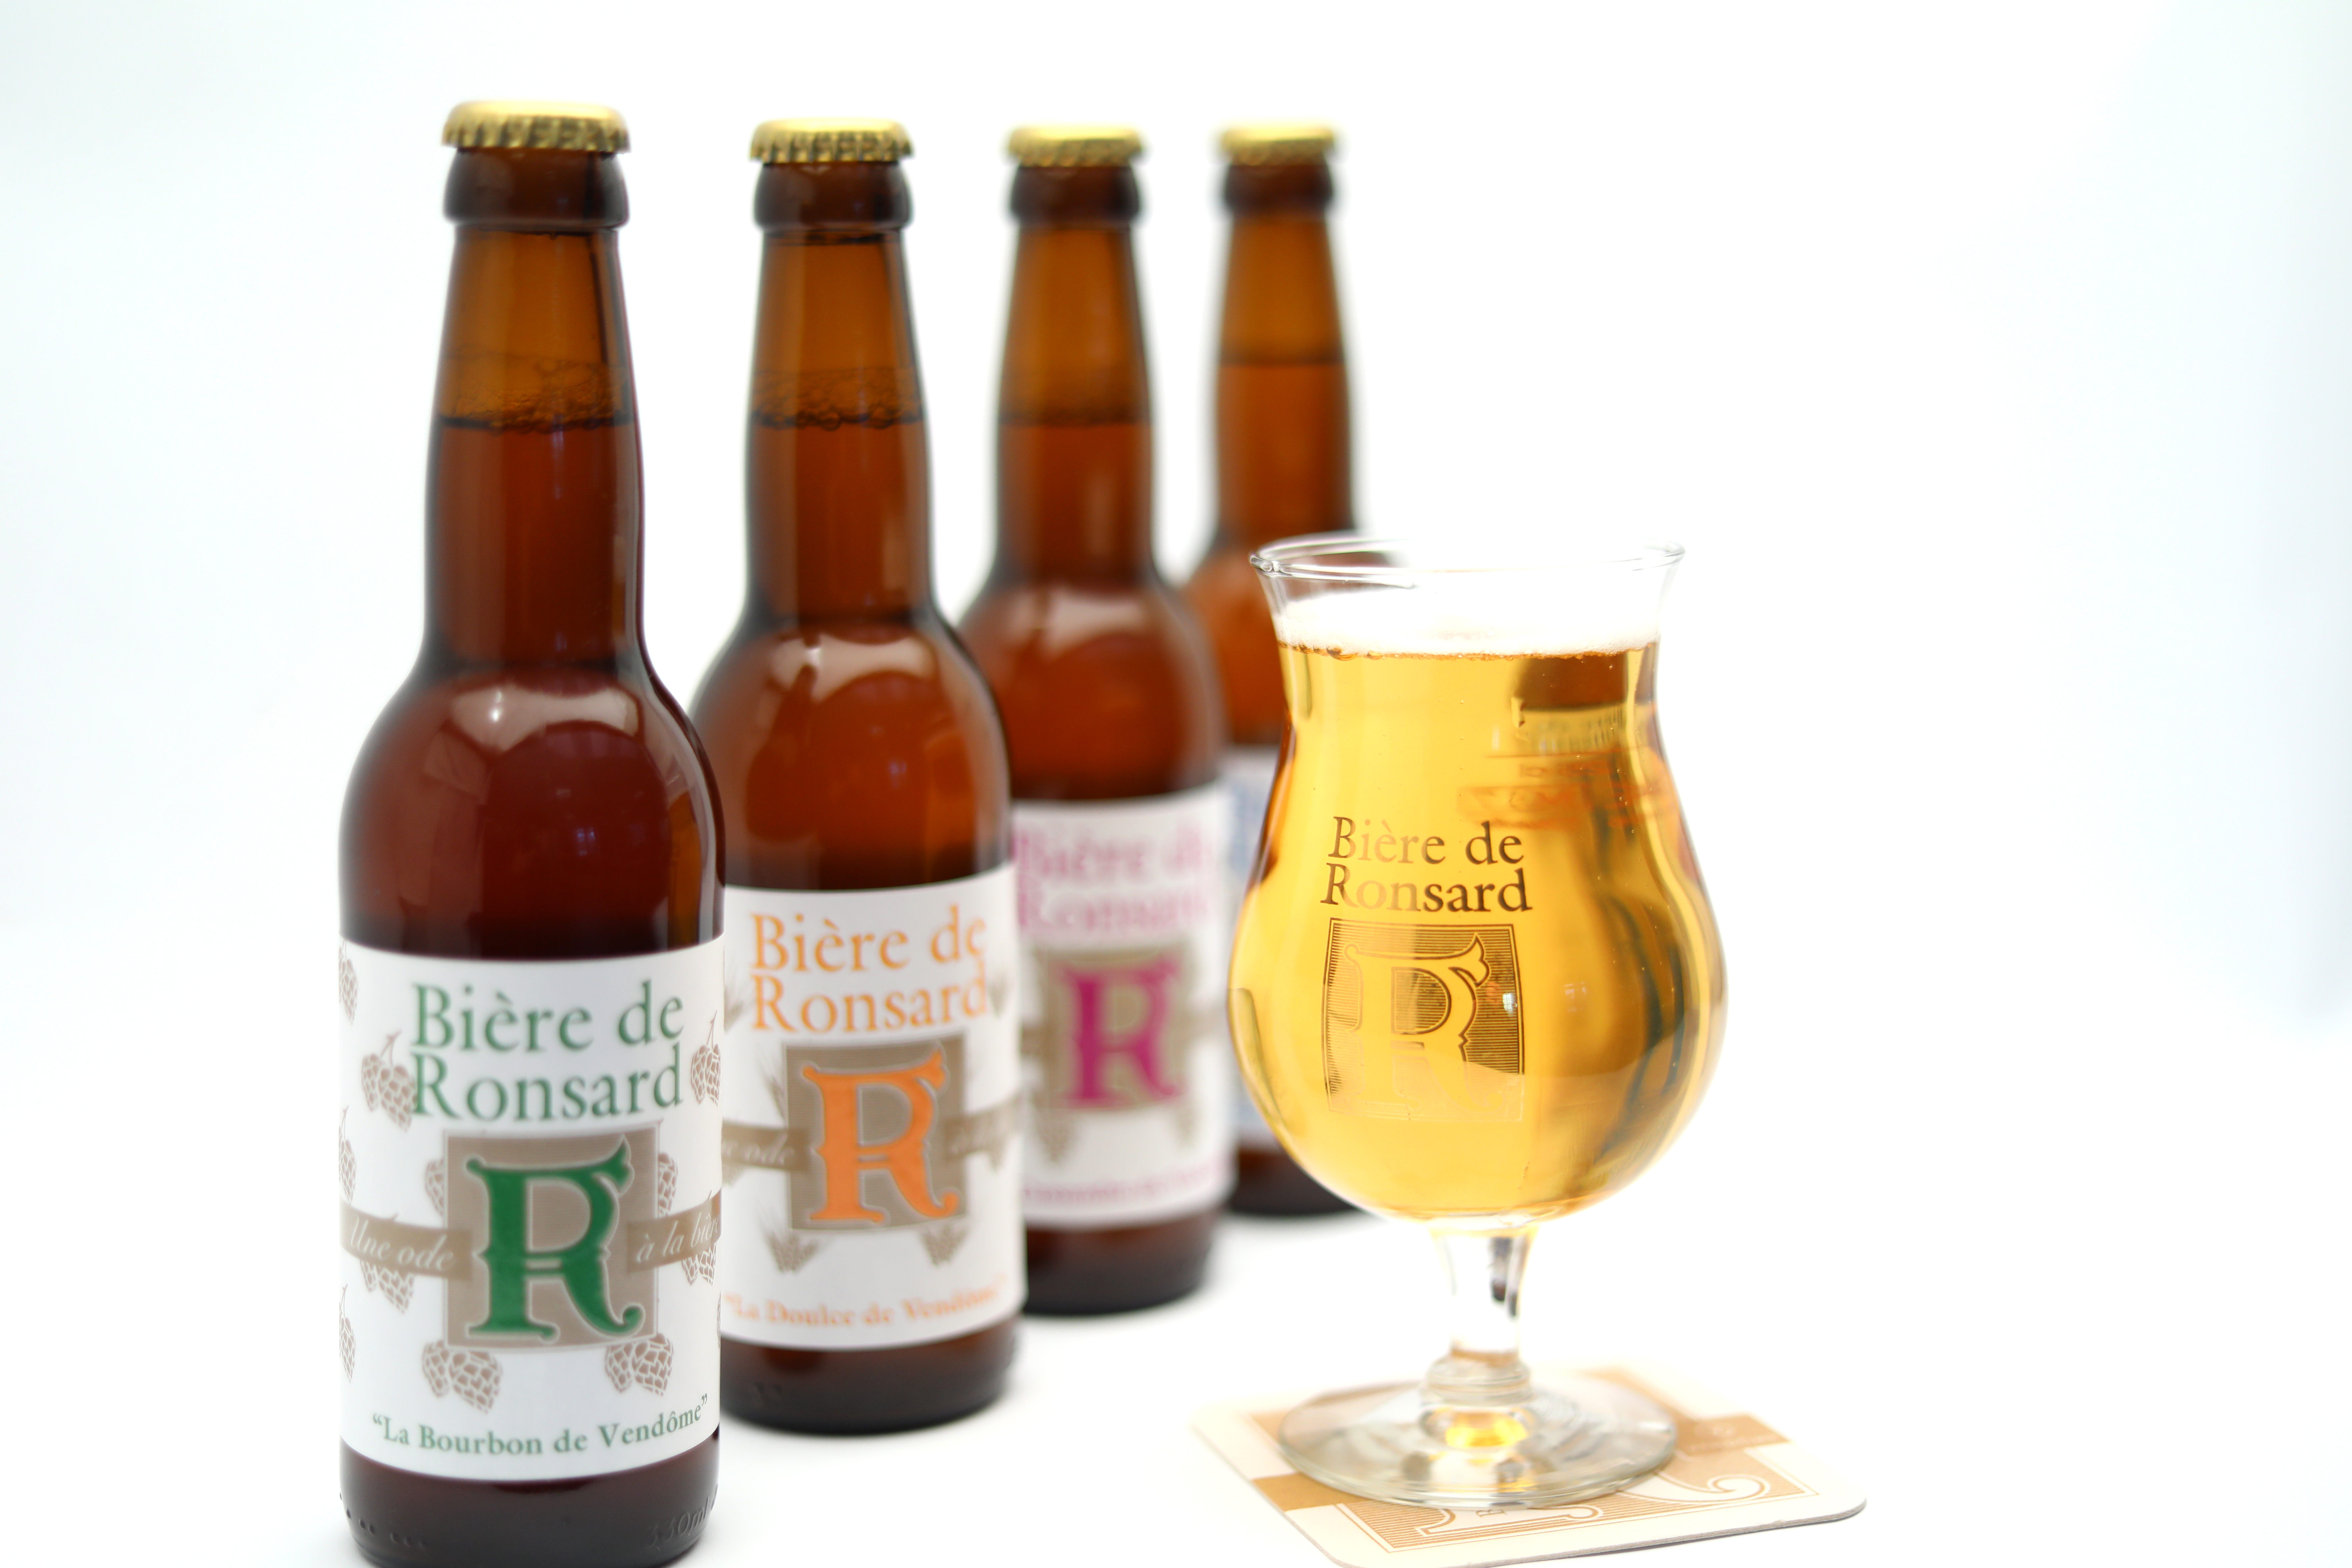 Bière de Ronsard